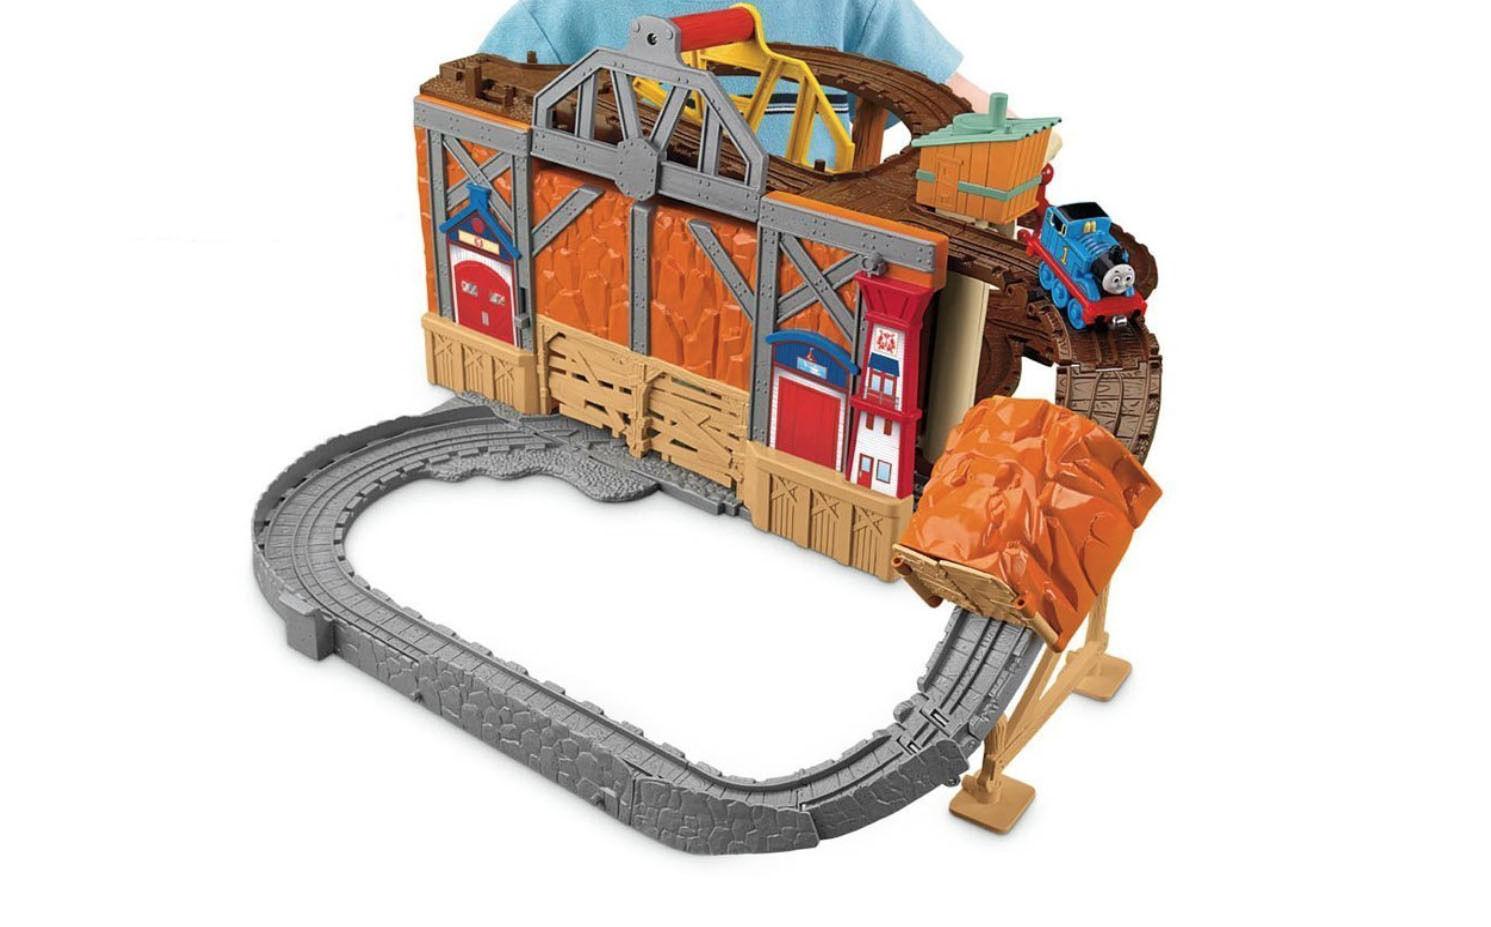 Thomas & Friends Take-n-Play Misty Island